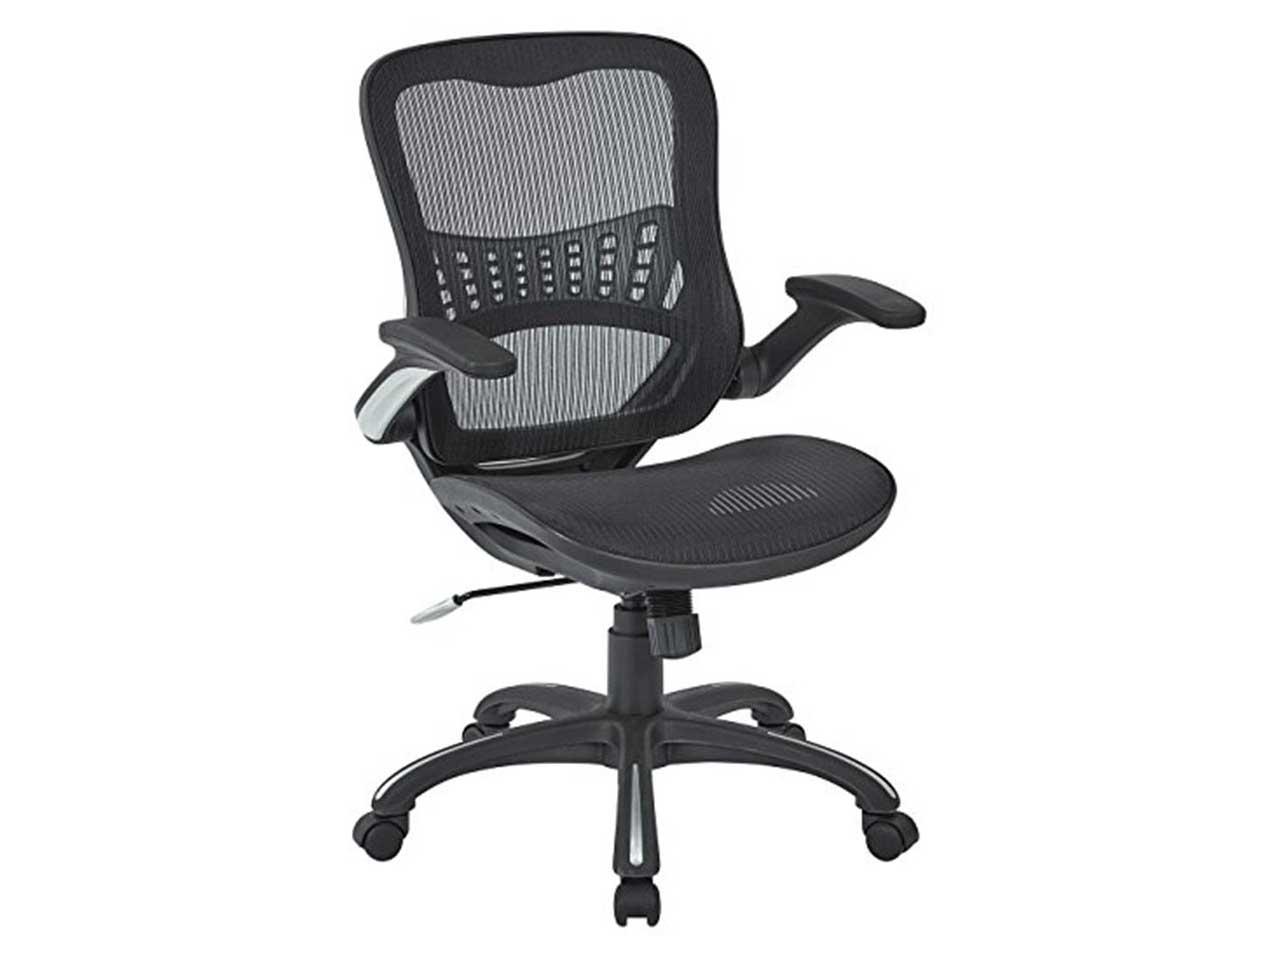 Office Star Mesh Back & Seat